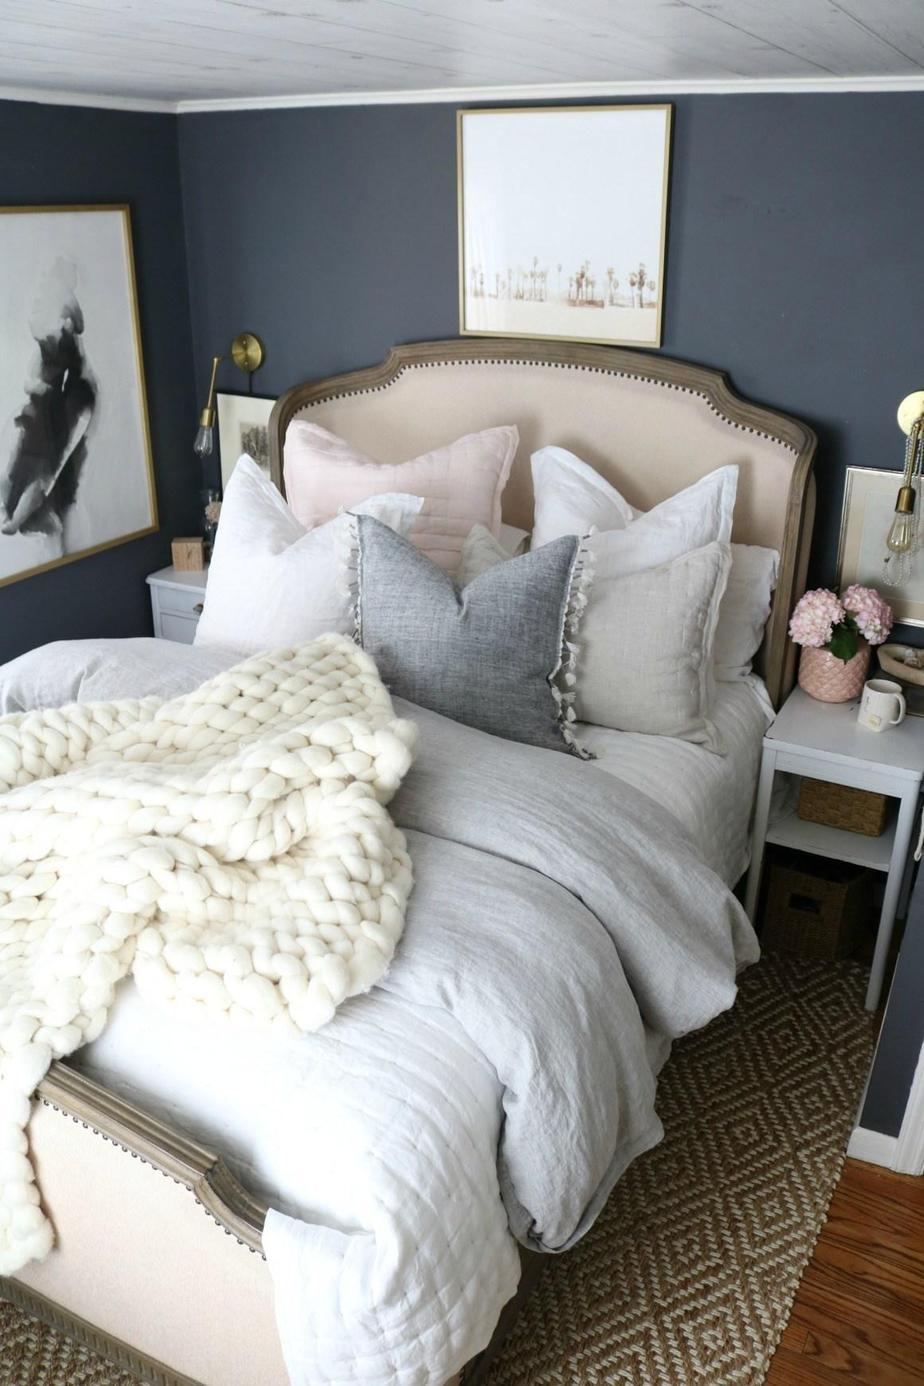 8. Make Your Bedding Fluffy by simphome.com